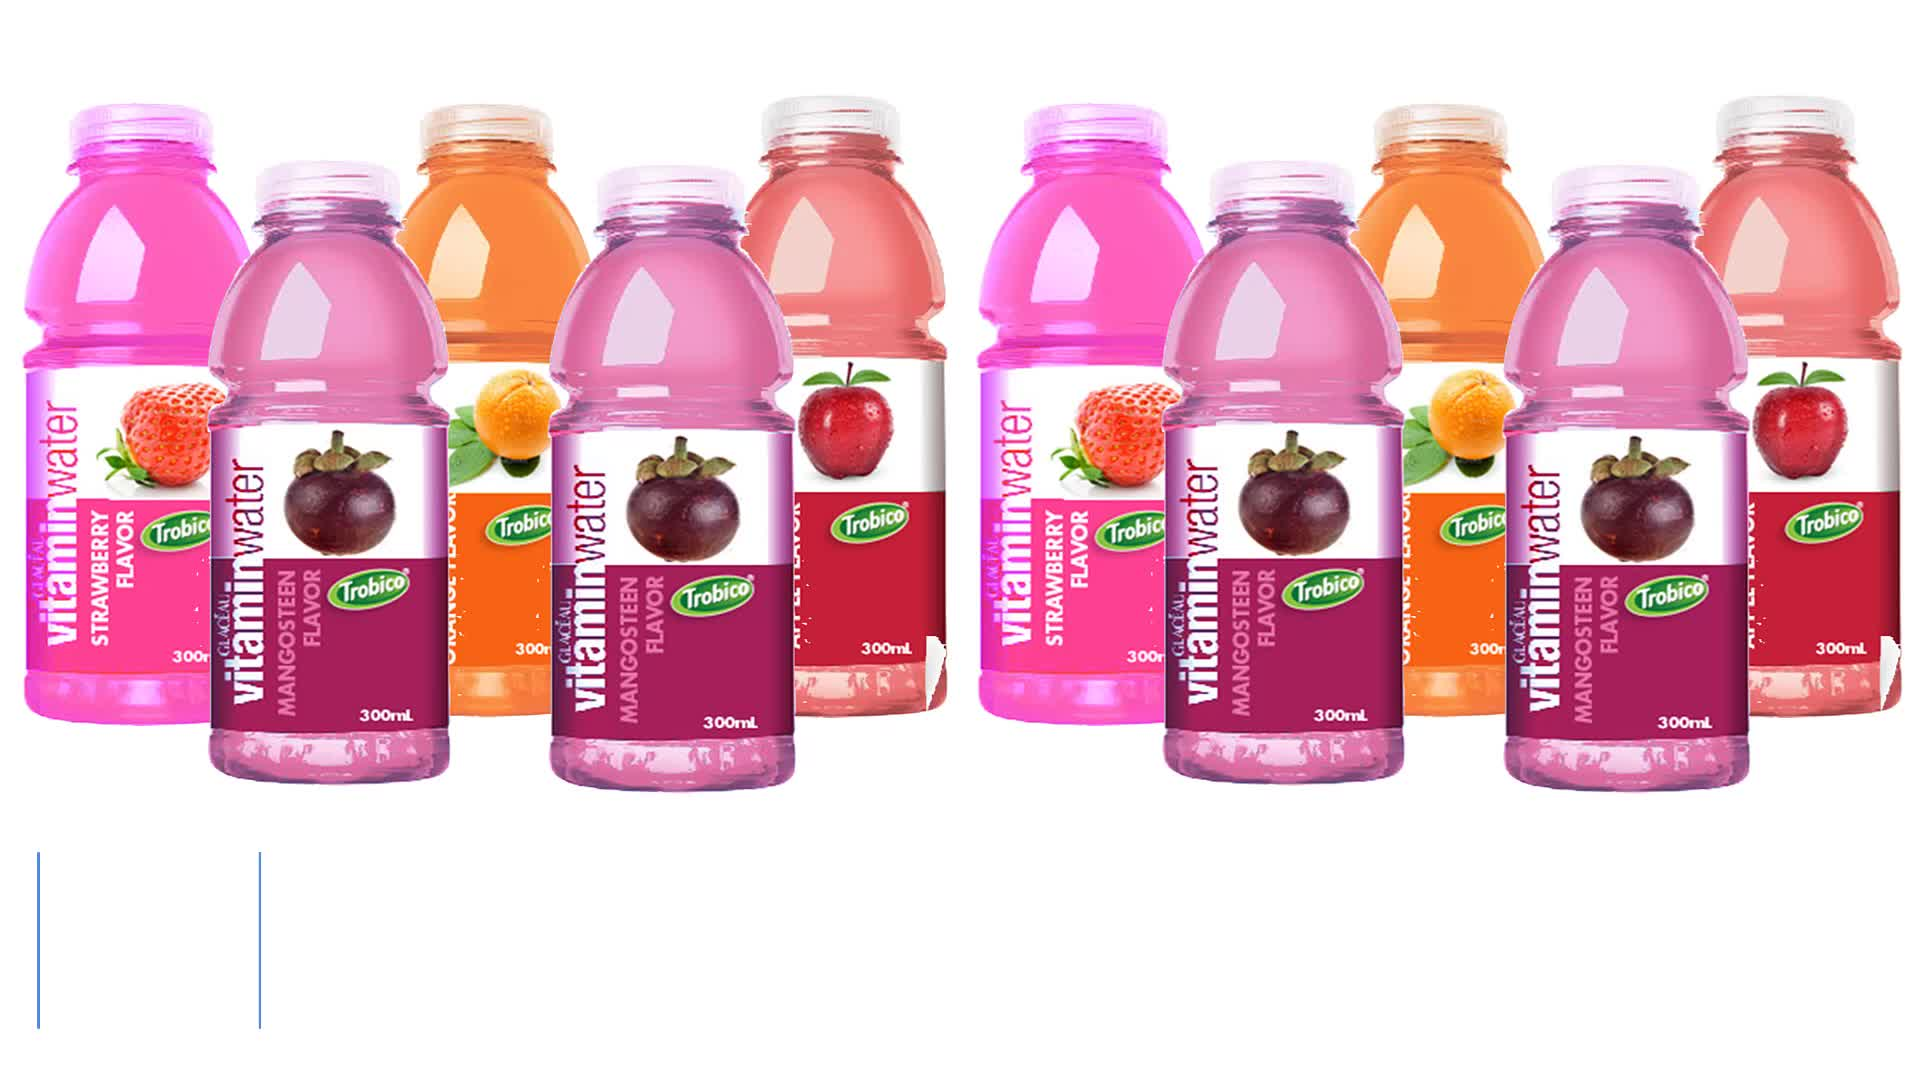 Vitamin water strawberry flavor